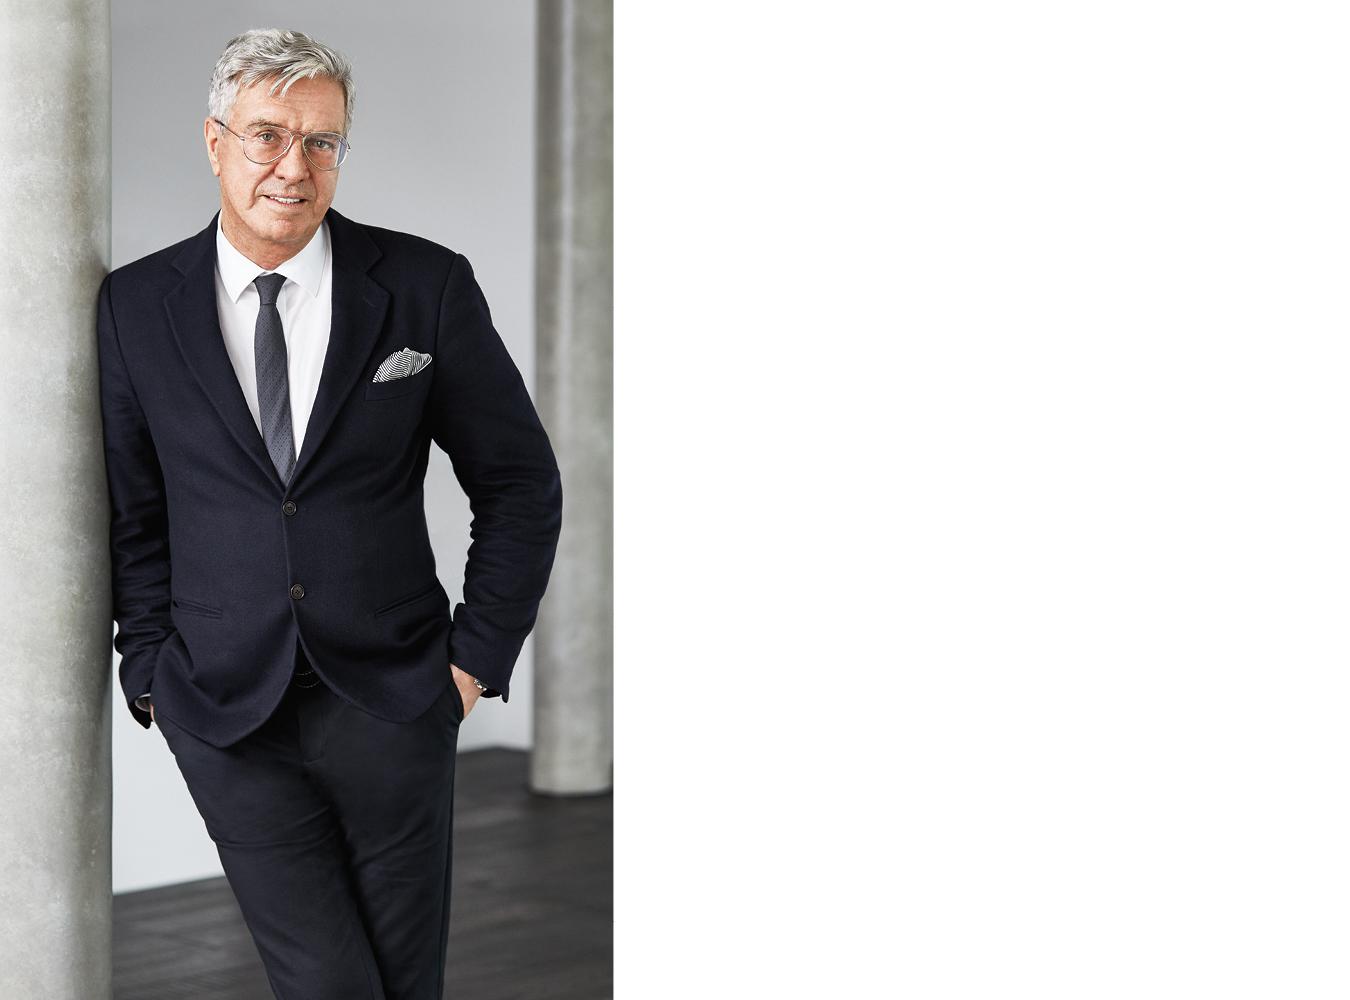 Unternehmen - Helmut Schlotterer neu